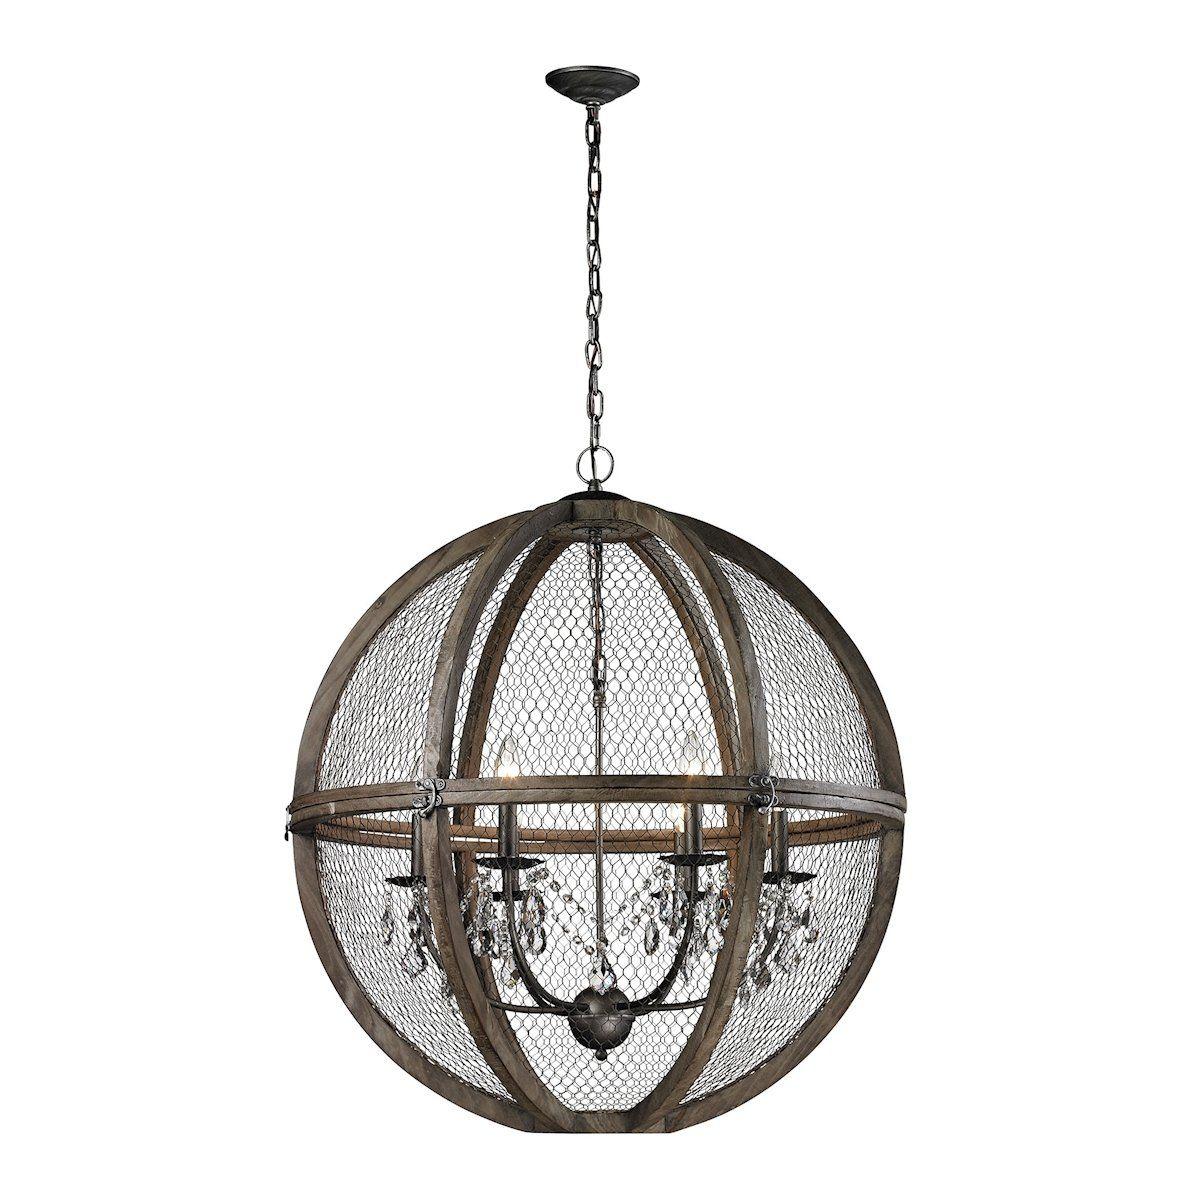 Renaissance Invention Wood And Wire Chandelier - Large | Renaissance ...